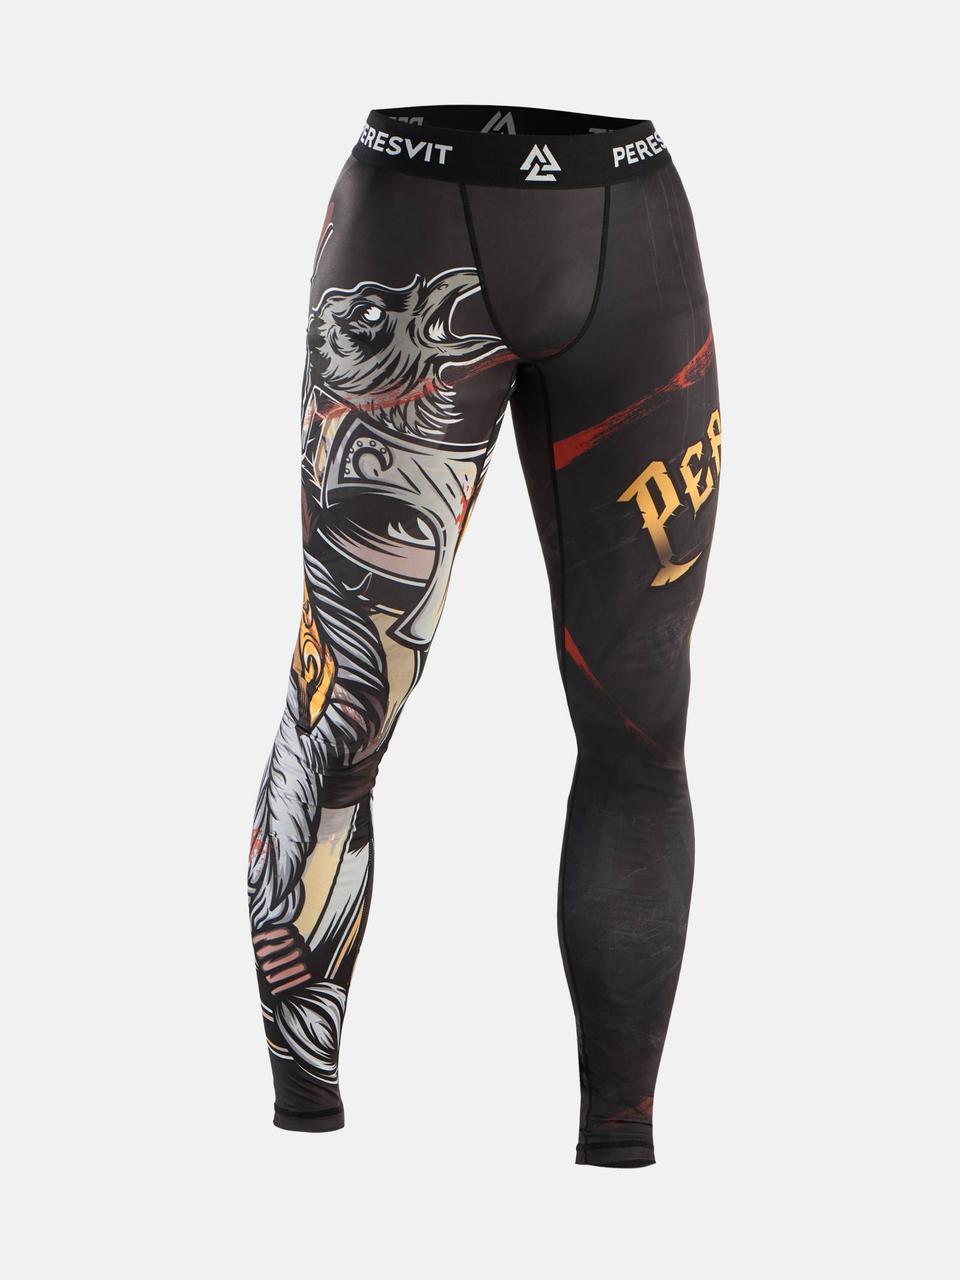 Компрессионные штаны Peresvit Odin Blessing MMA Leggings